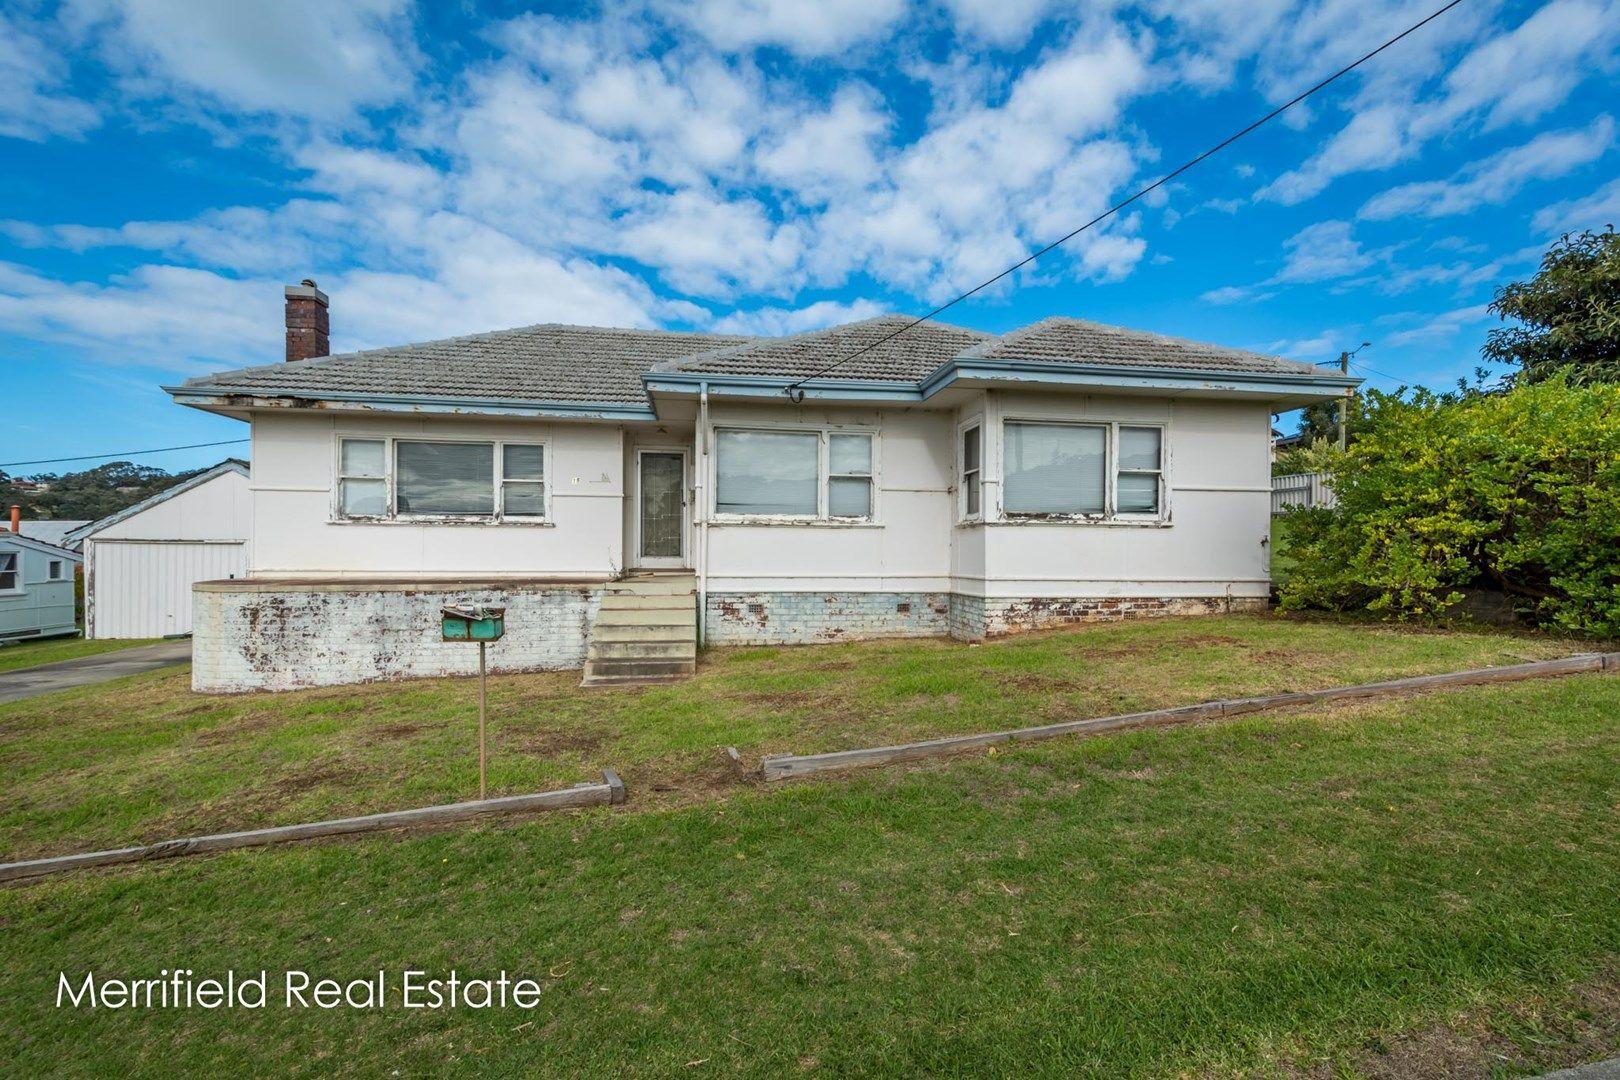 16-18 Alicia Street, Mount Melville WA 6330, Image 0